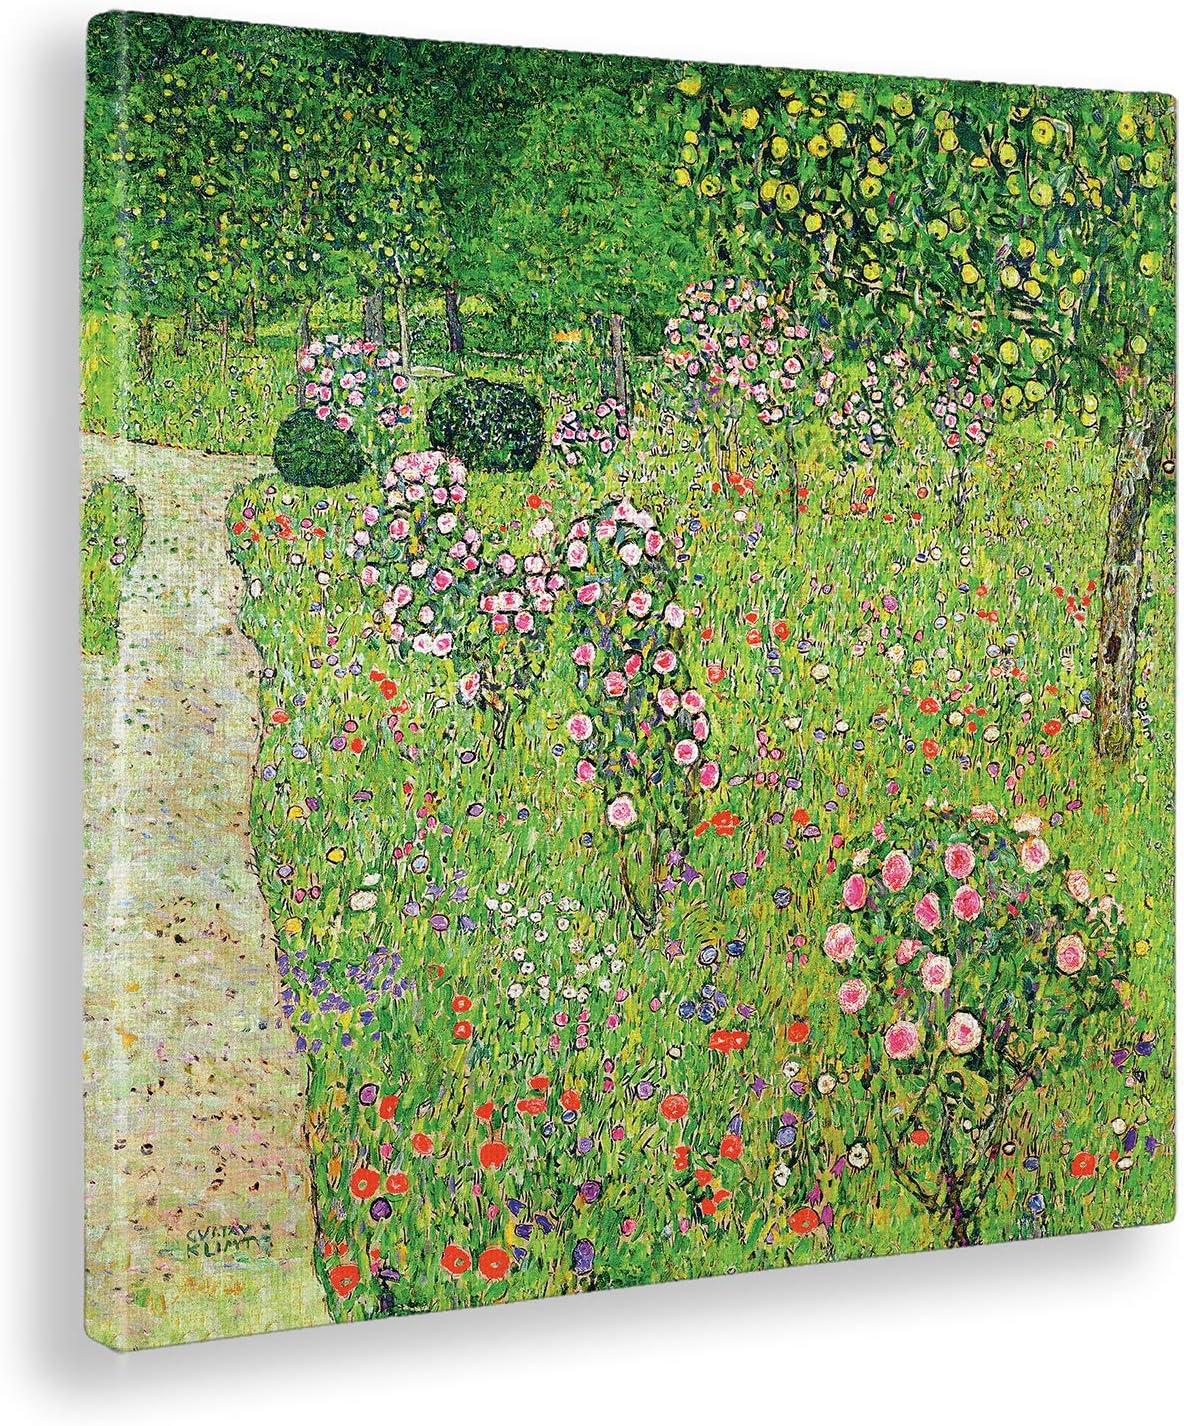 Giallobus - Cuadro - Gustav Klimt - Huerto con Rosas -Estampado en Lienzo - Listo para Colgar - Varios tamaños - 70x70 cm